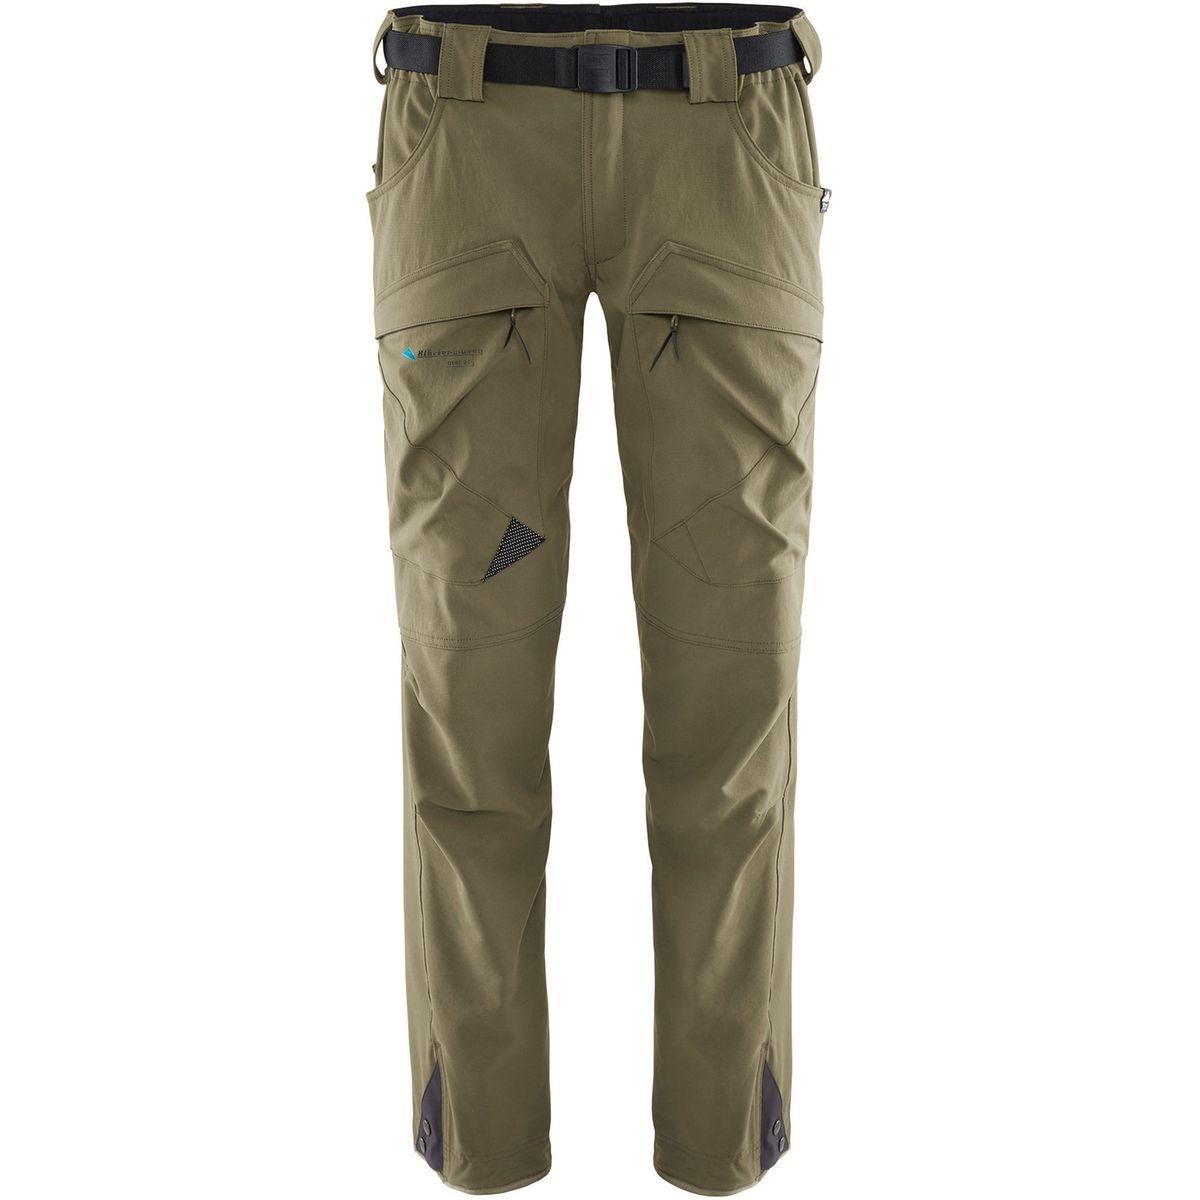 Gere 2.0 - Pantalon Homme - olive